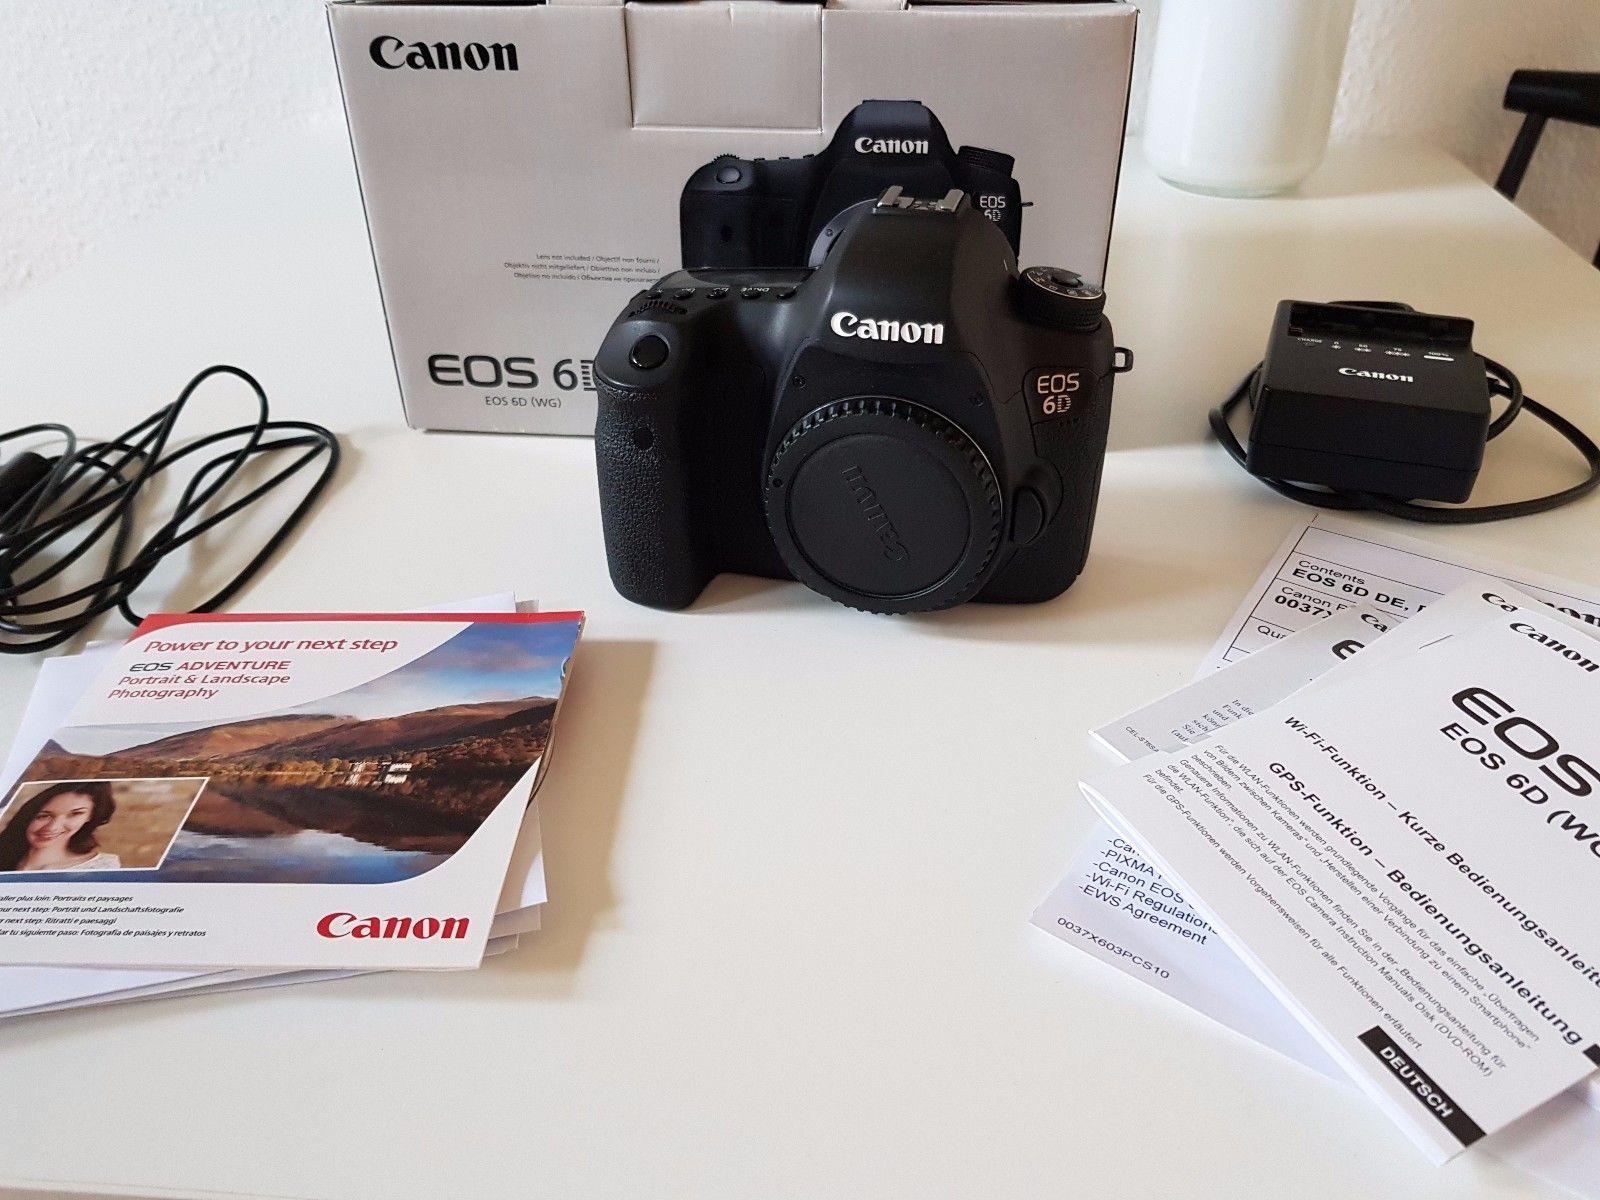 Canon EOS 6D 20,2 MP SLR-Digitalkamera (Body) Sehr guter Zustand Wie Neu